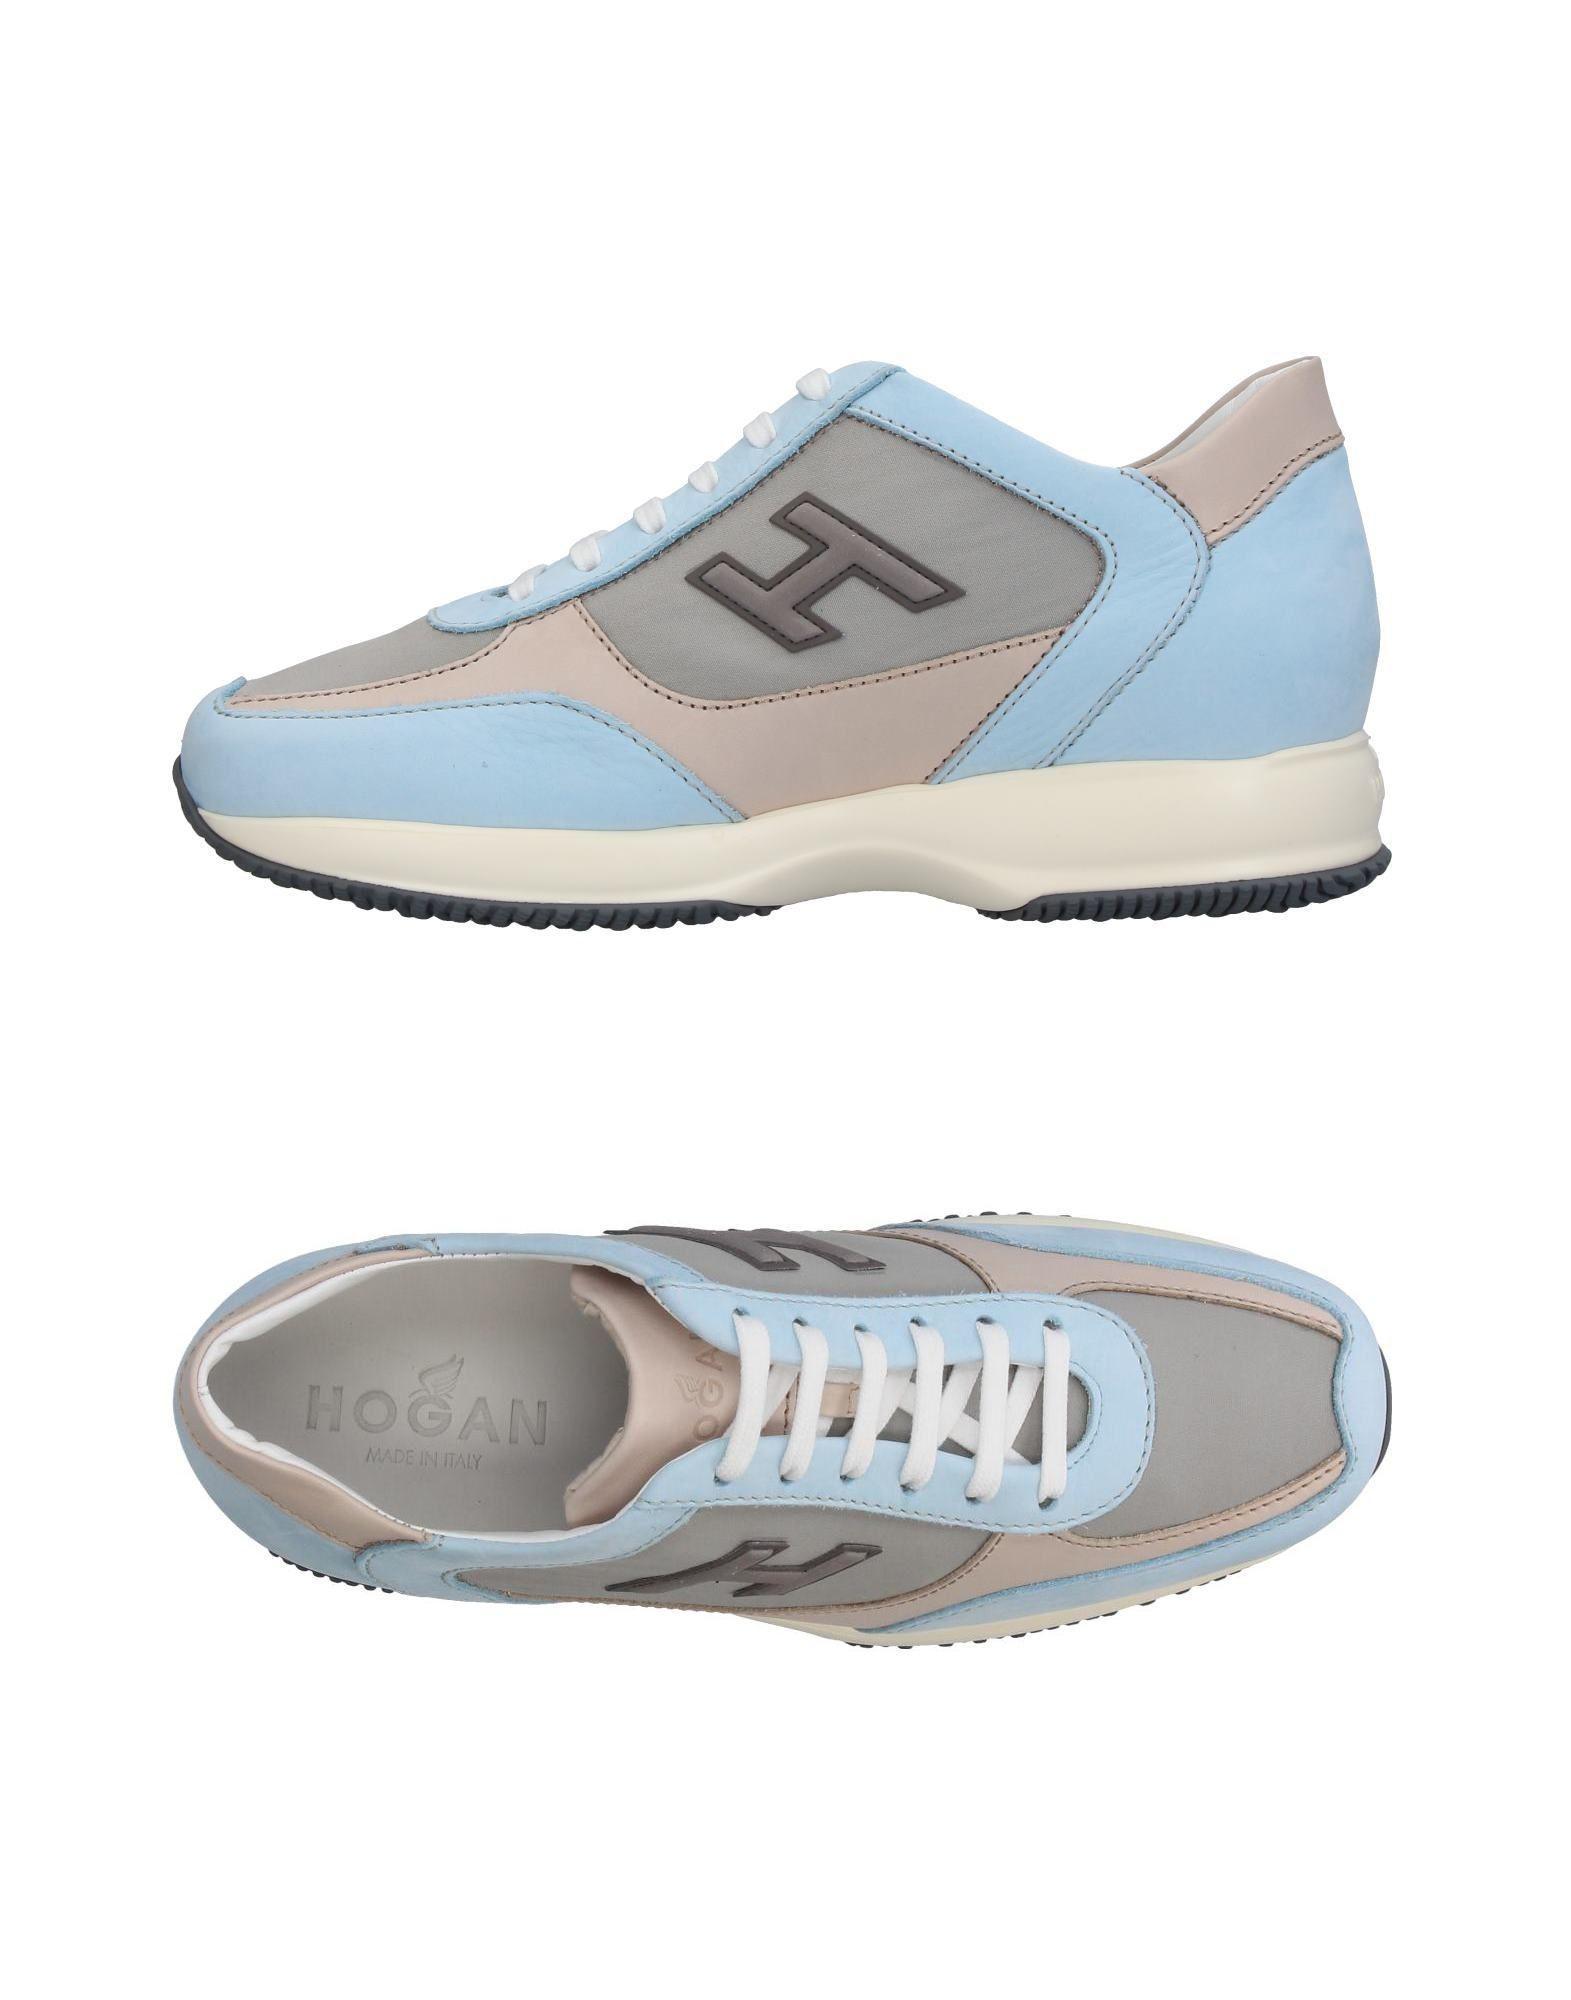 Hogan Bas-tops Et Chaussures De Sport CaJNL4G